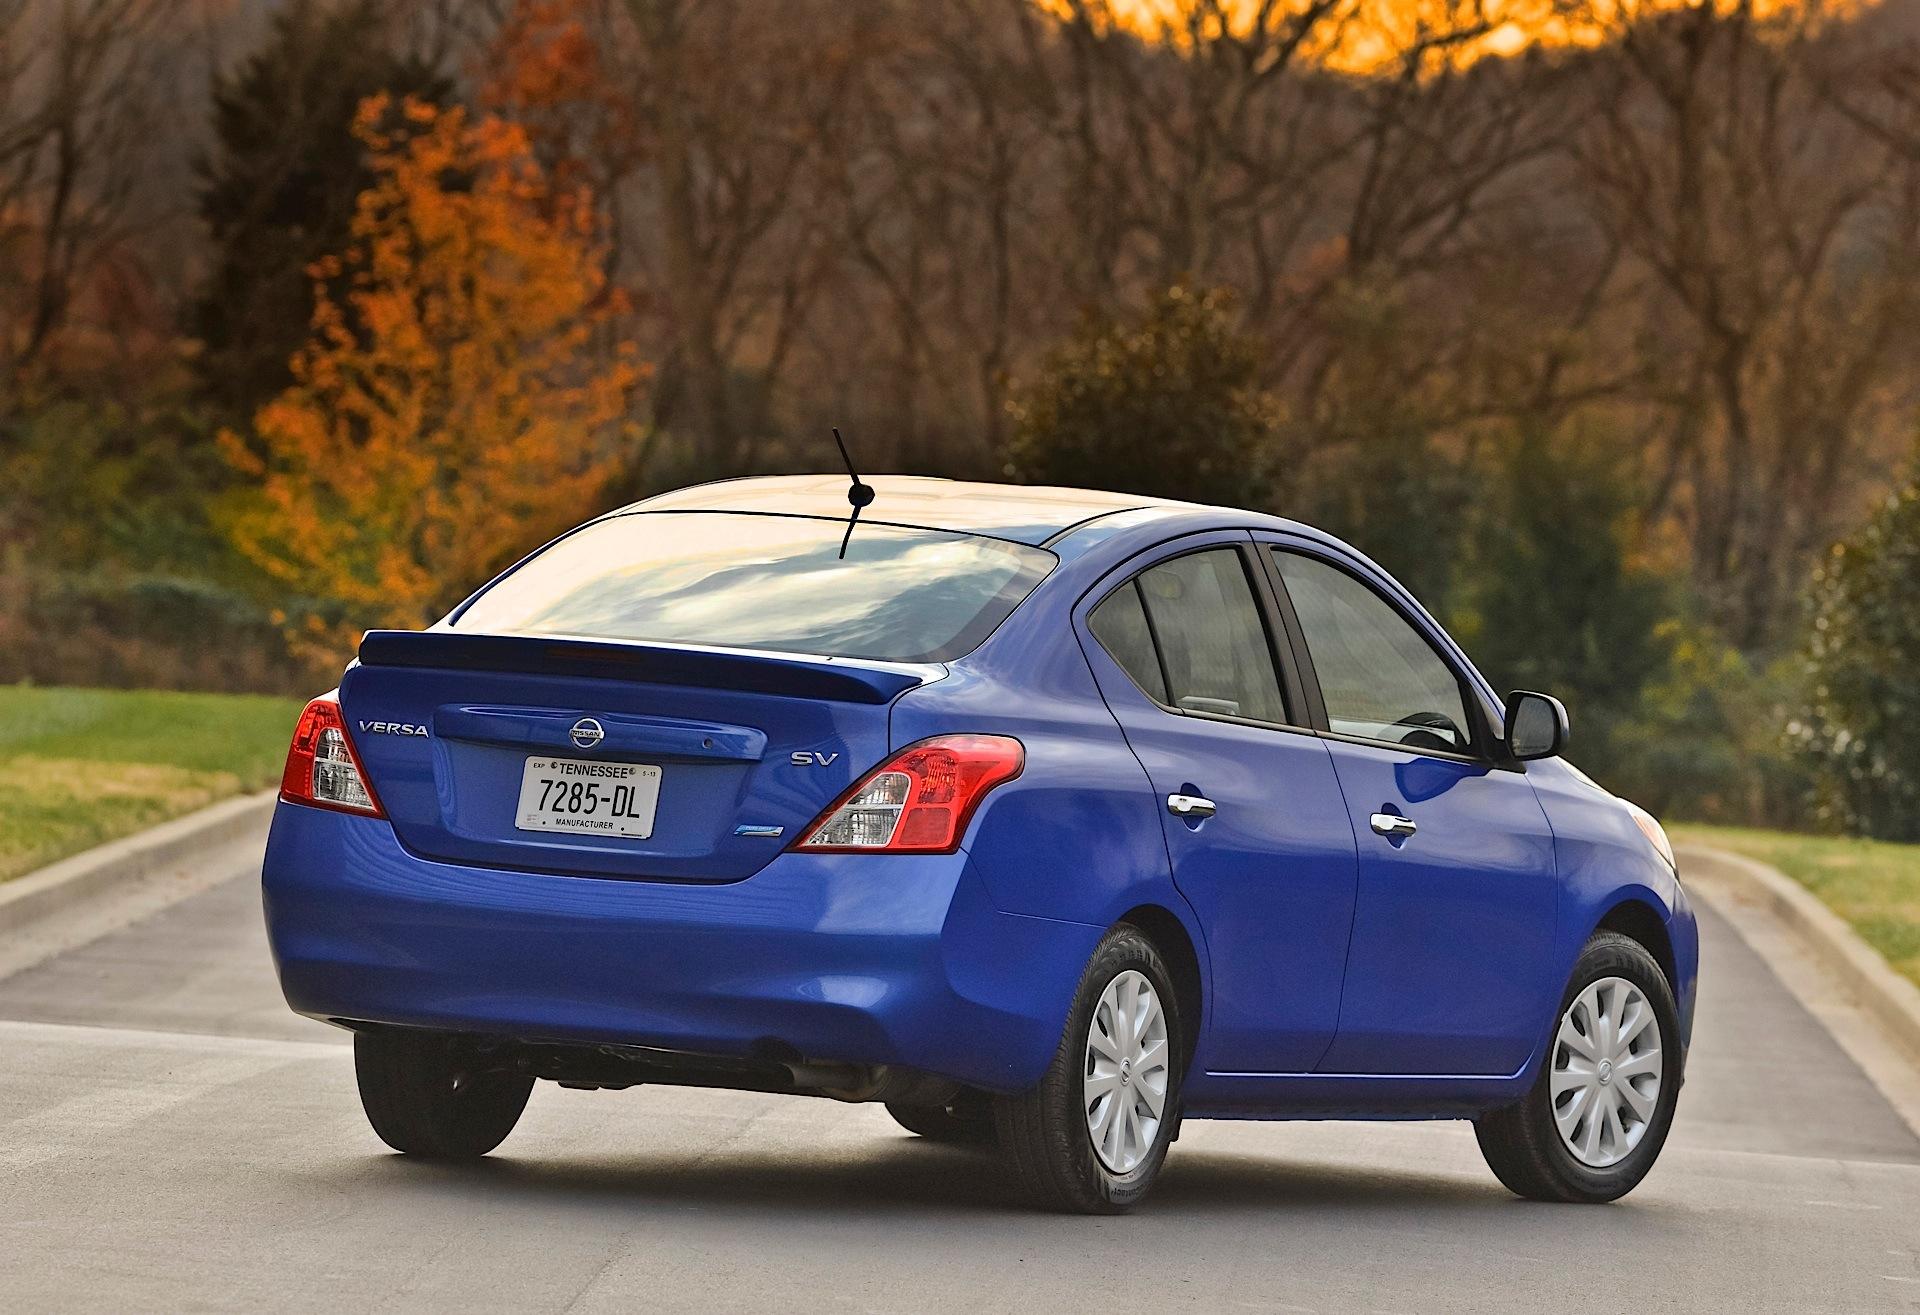 Nissan Tiida Versa Sedan Specs 2011 2012 2013 2014 2015 2016 2017 2018 Autoevolution